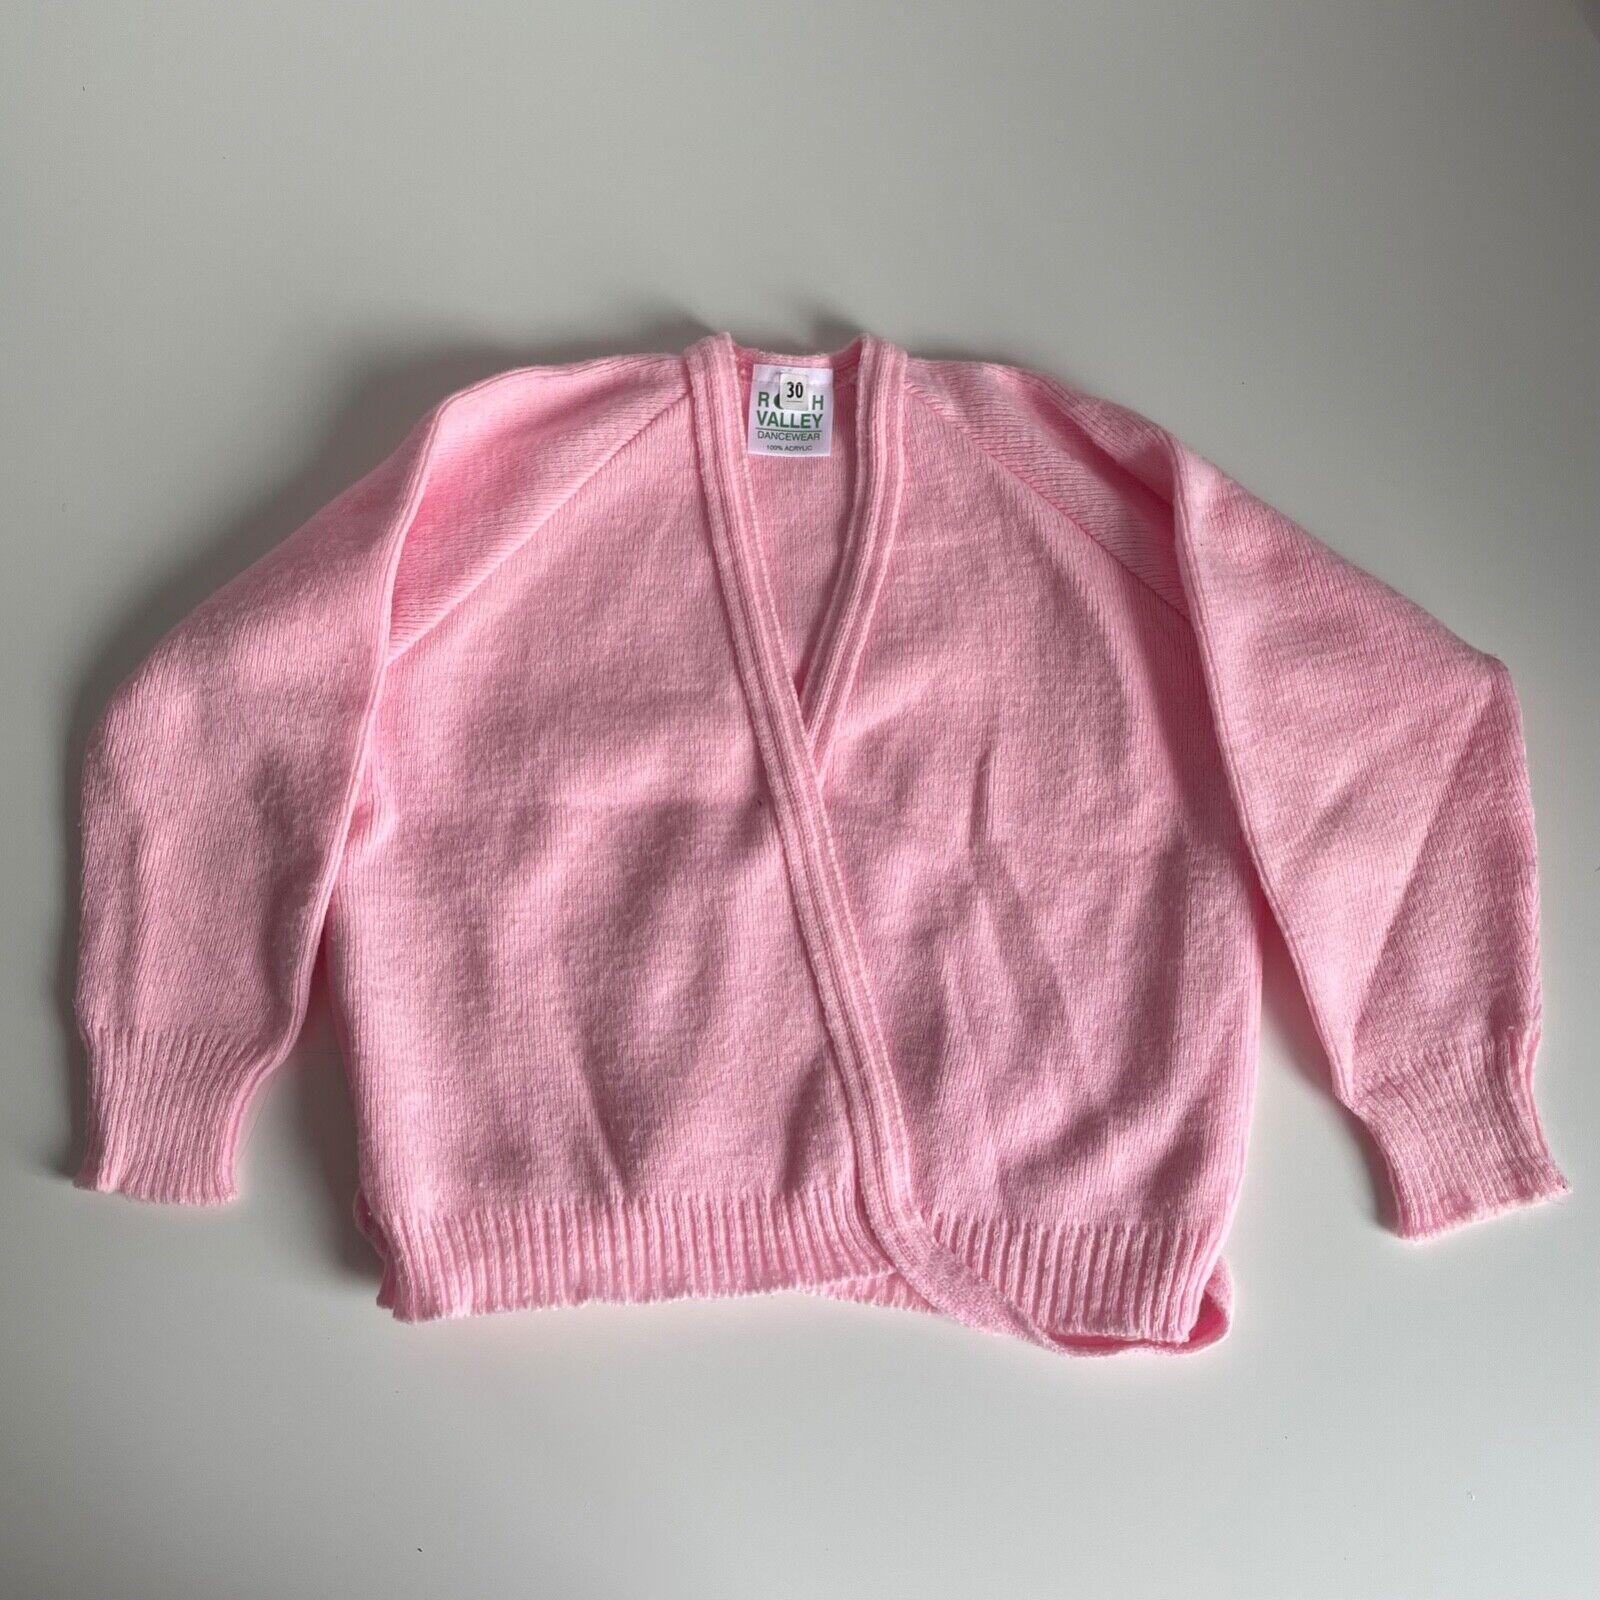 Roch Valley Ballet Cardigan, Pink, 30